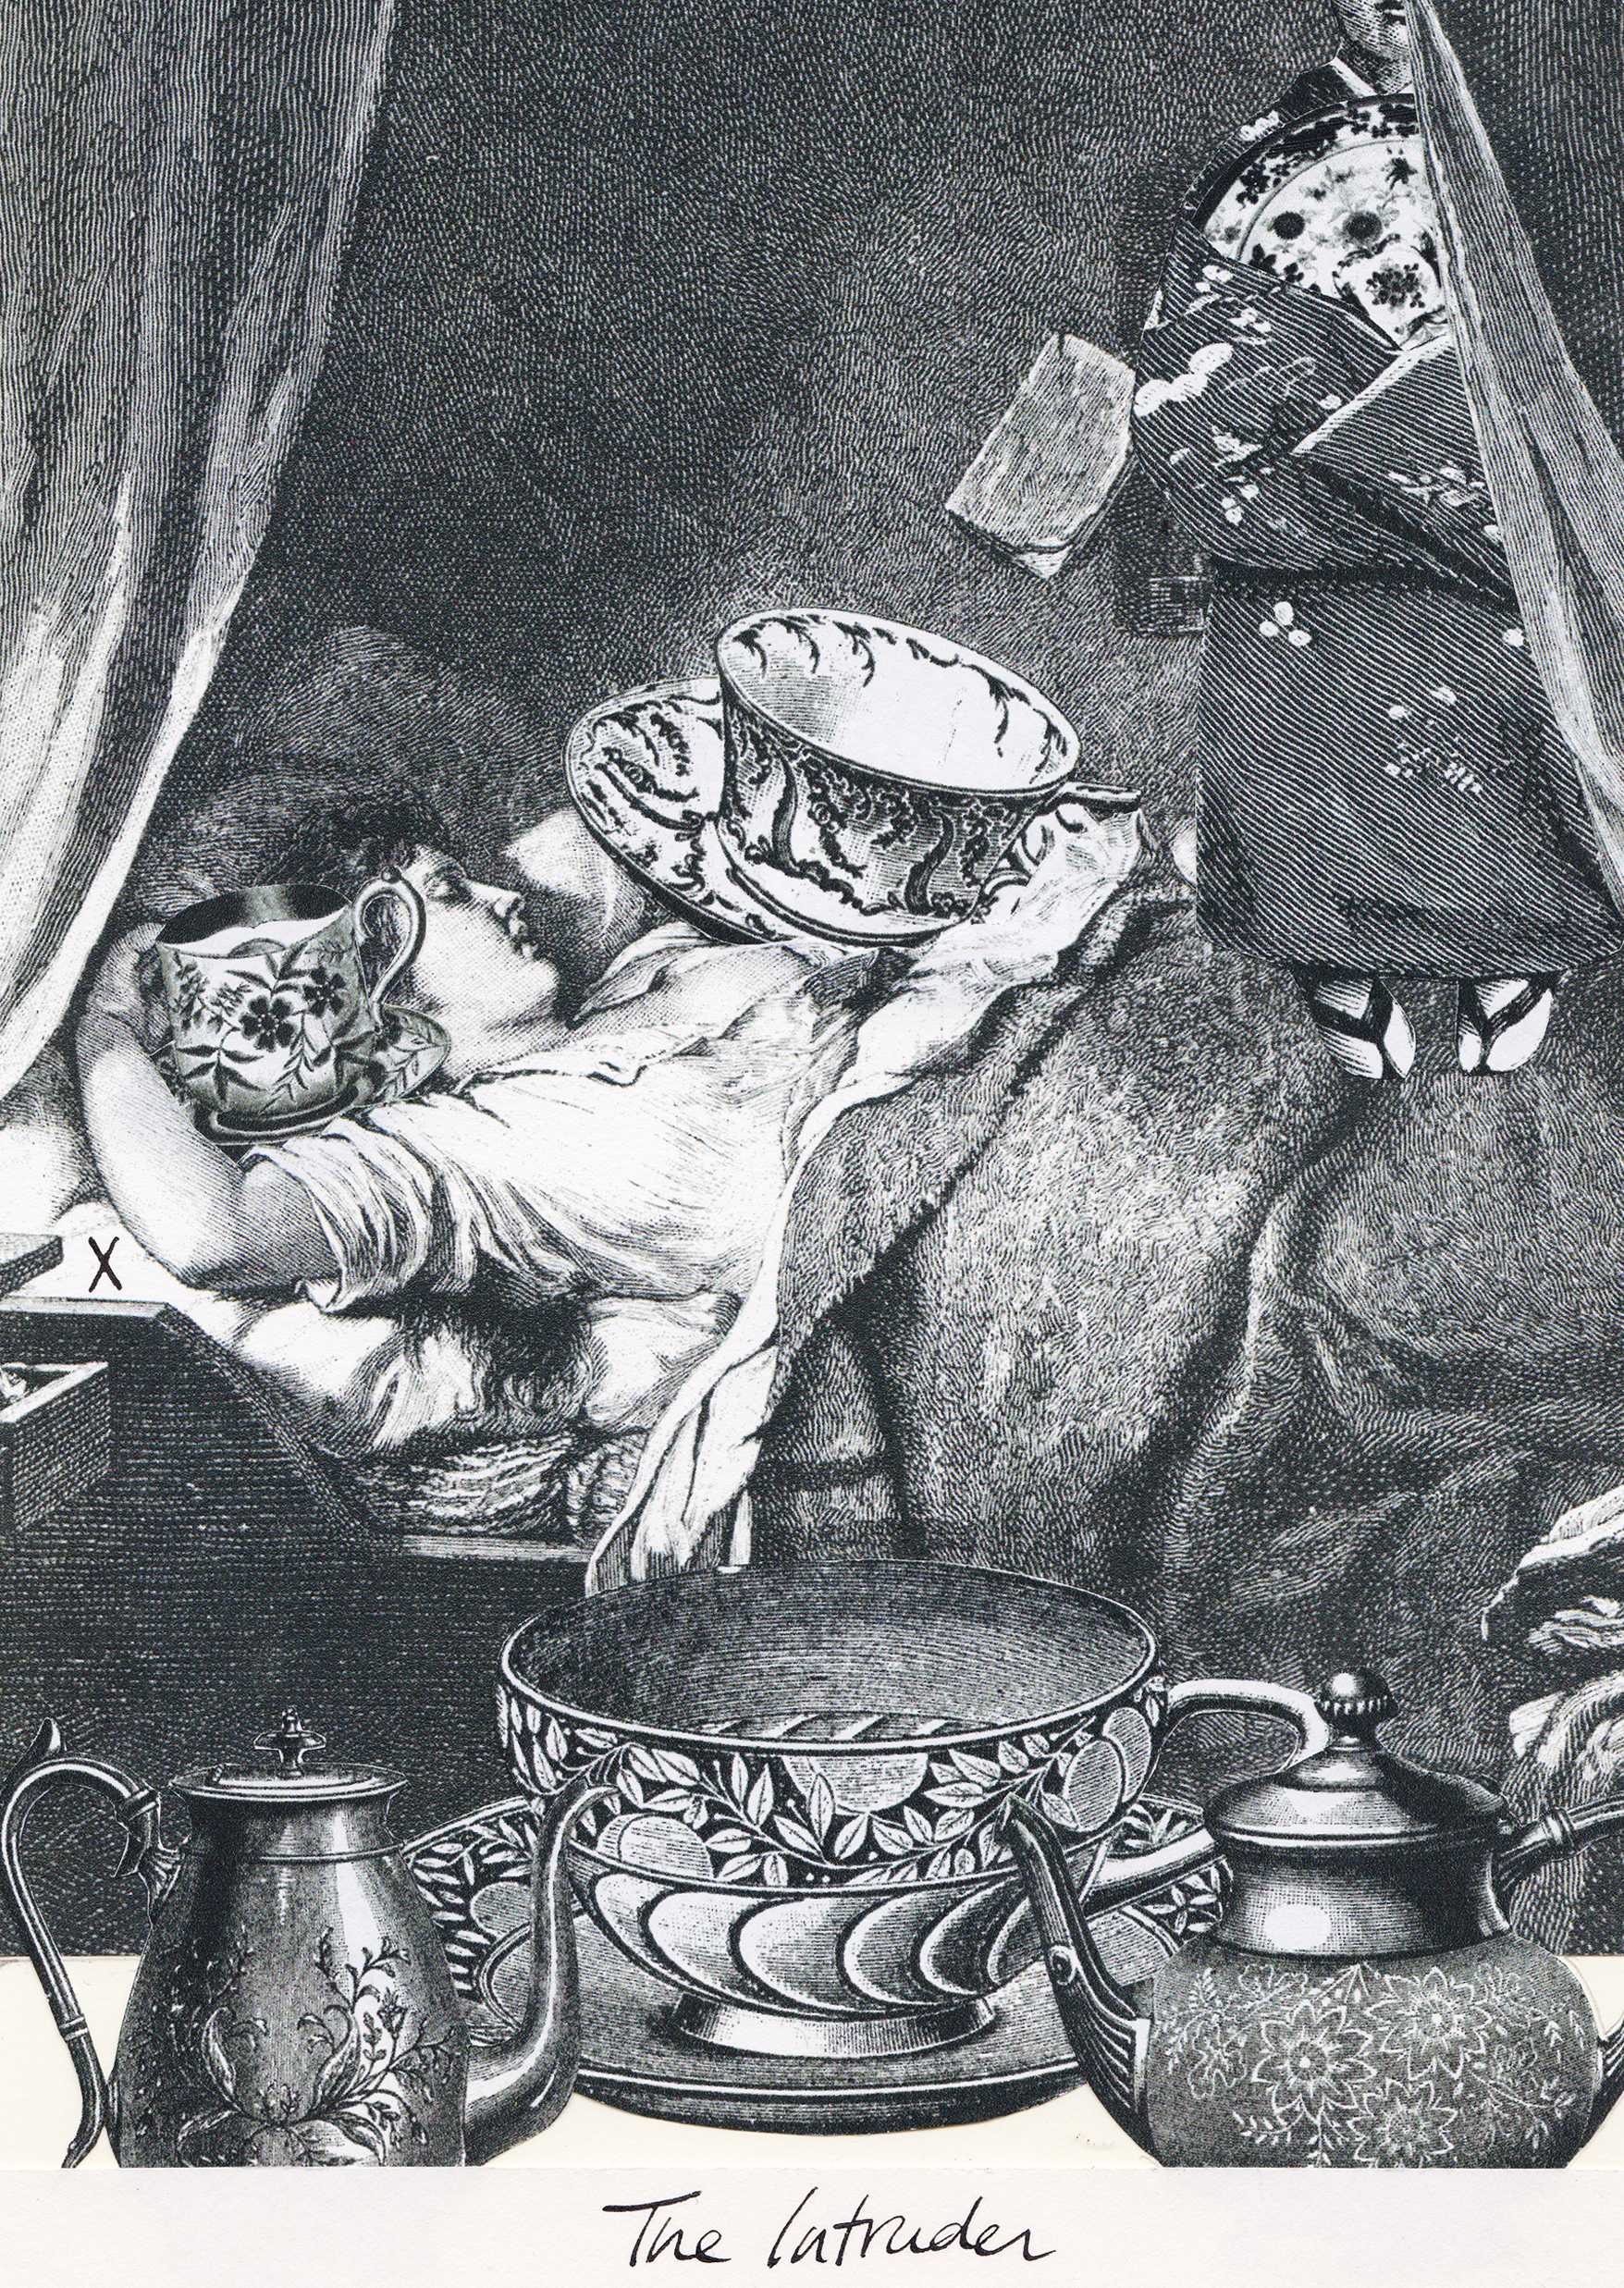 The Intruder, Collage Giclée print on Hahnemühle Photo Rag, 21x14.8cm